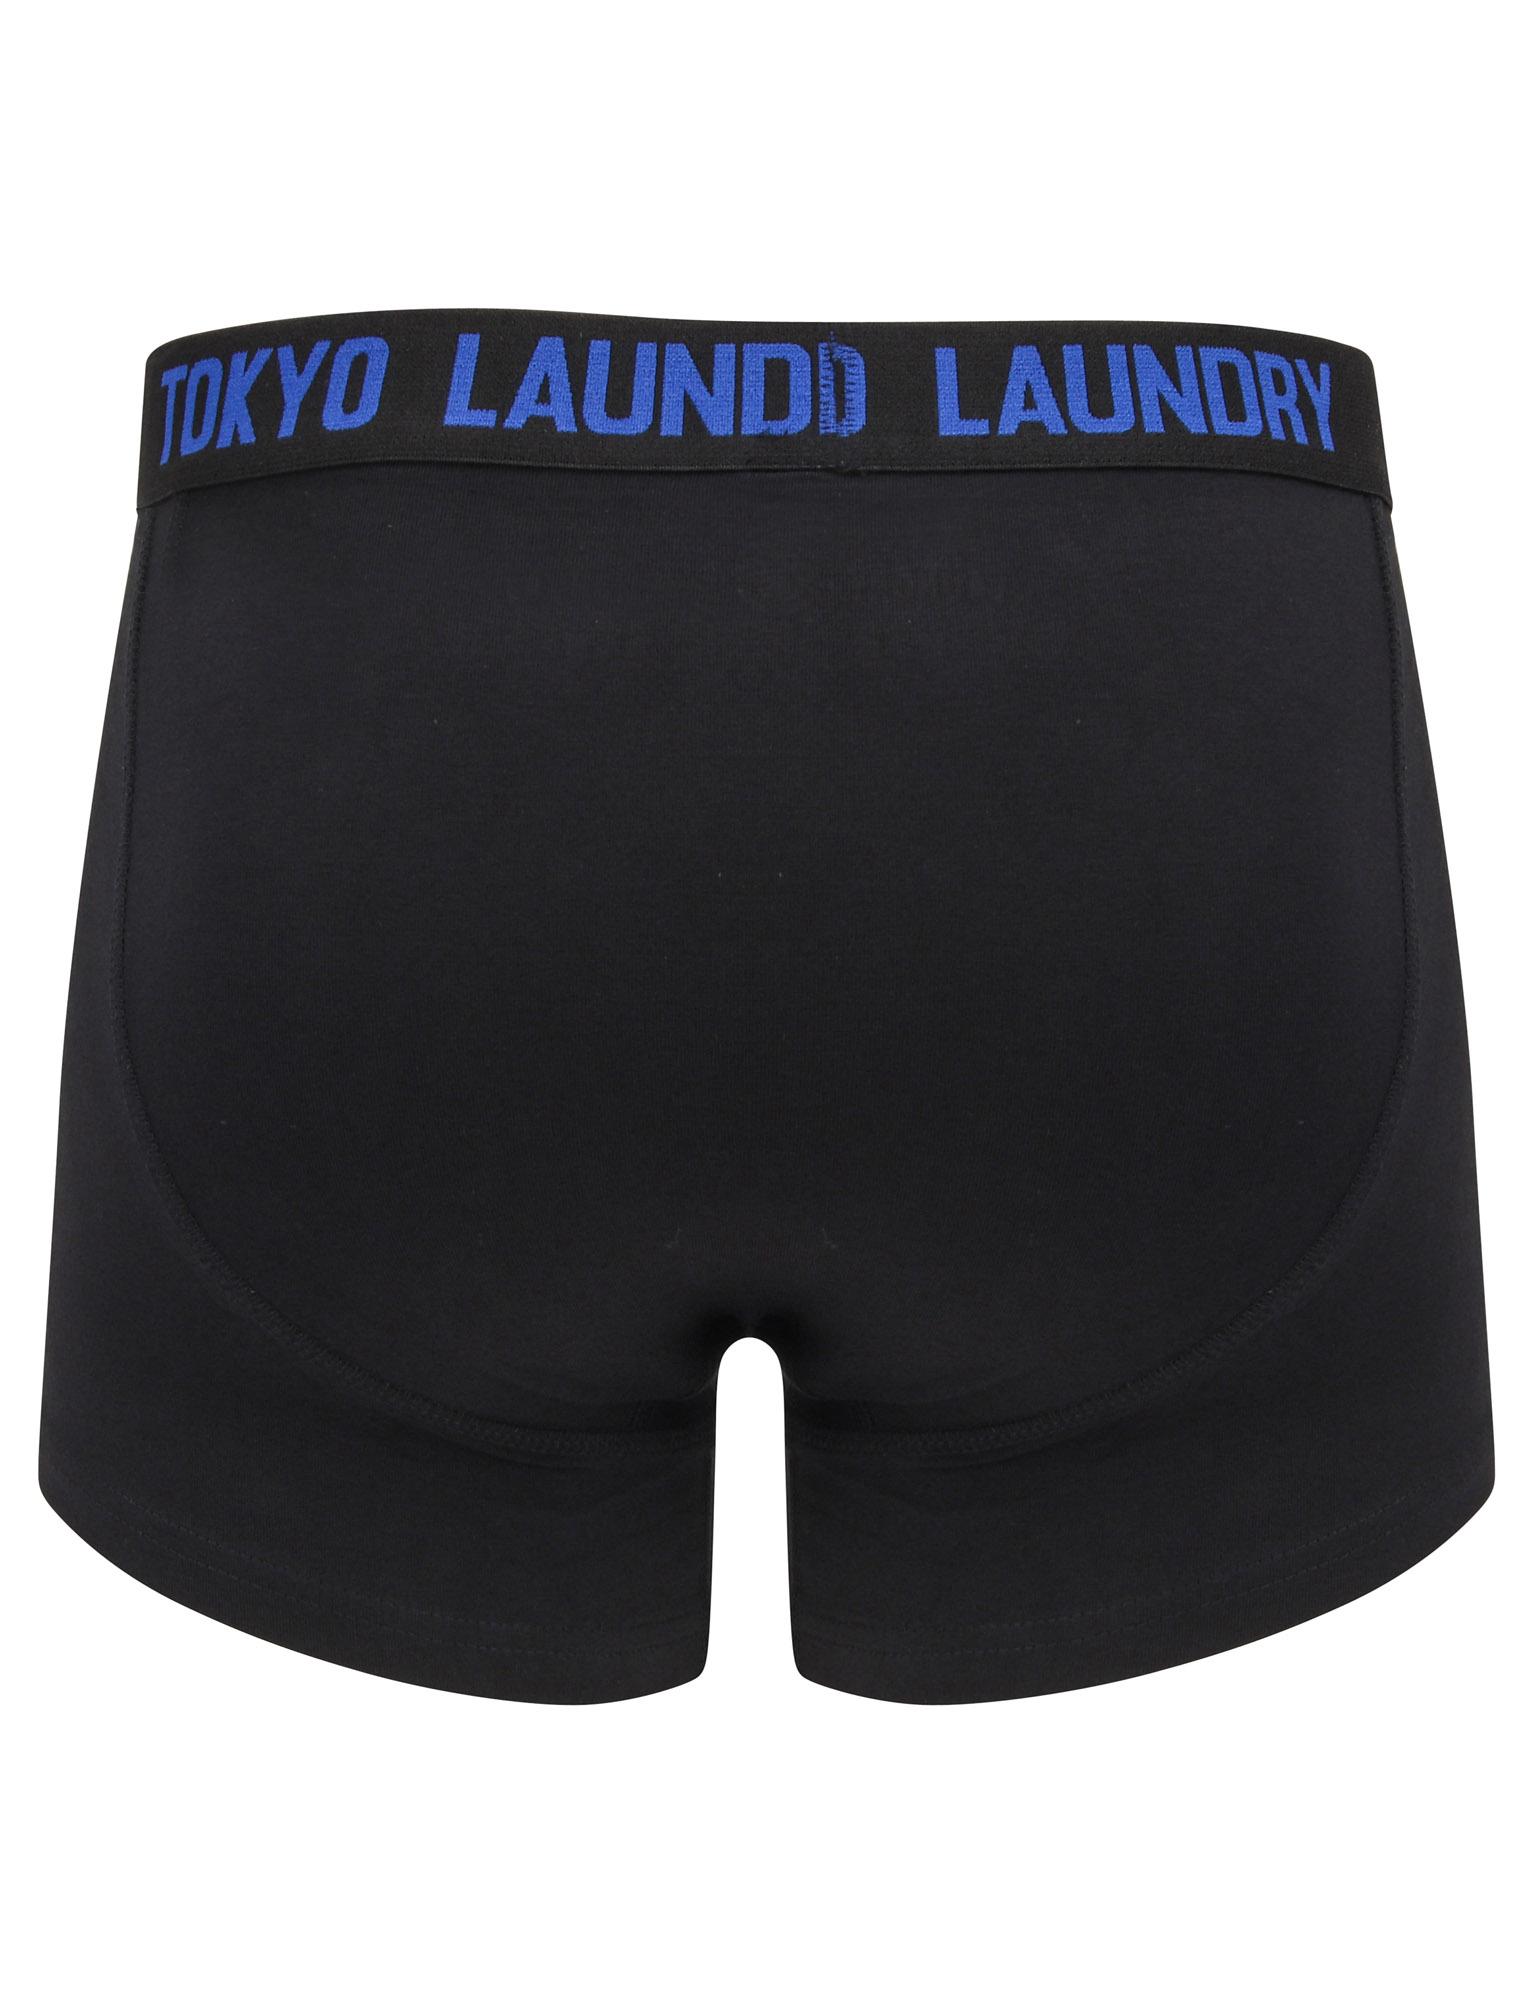 New-Mens-Tokyo-Laundry-2-Pack-Cotton-Rich-Boxer-Shorts-Set-Trunks-Size-S-XXL thumbnail 74